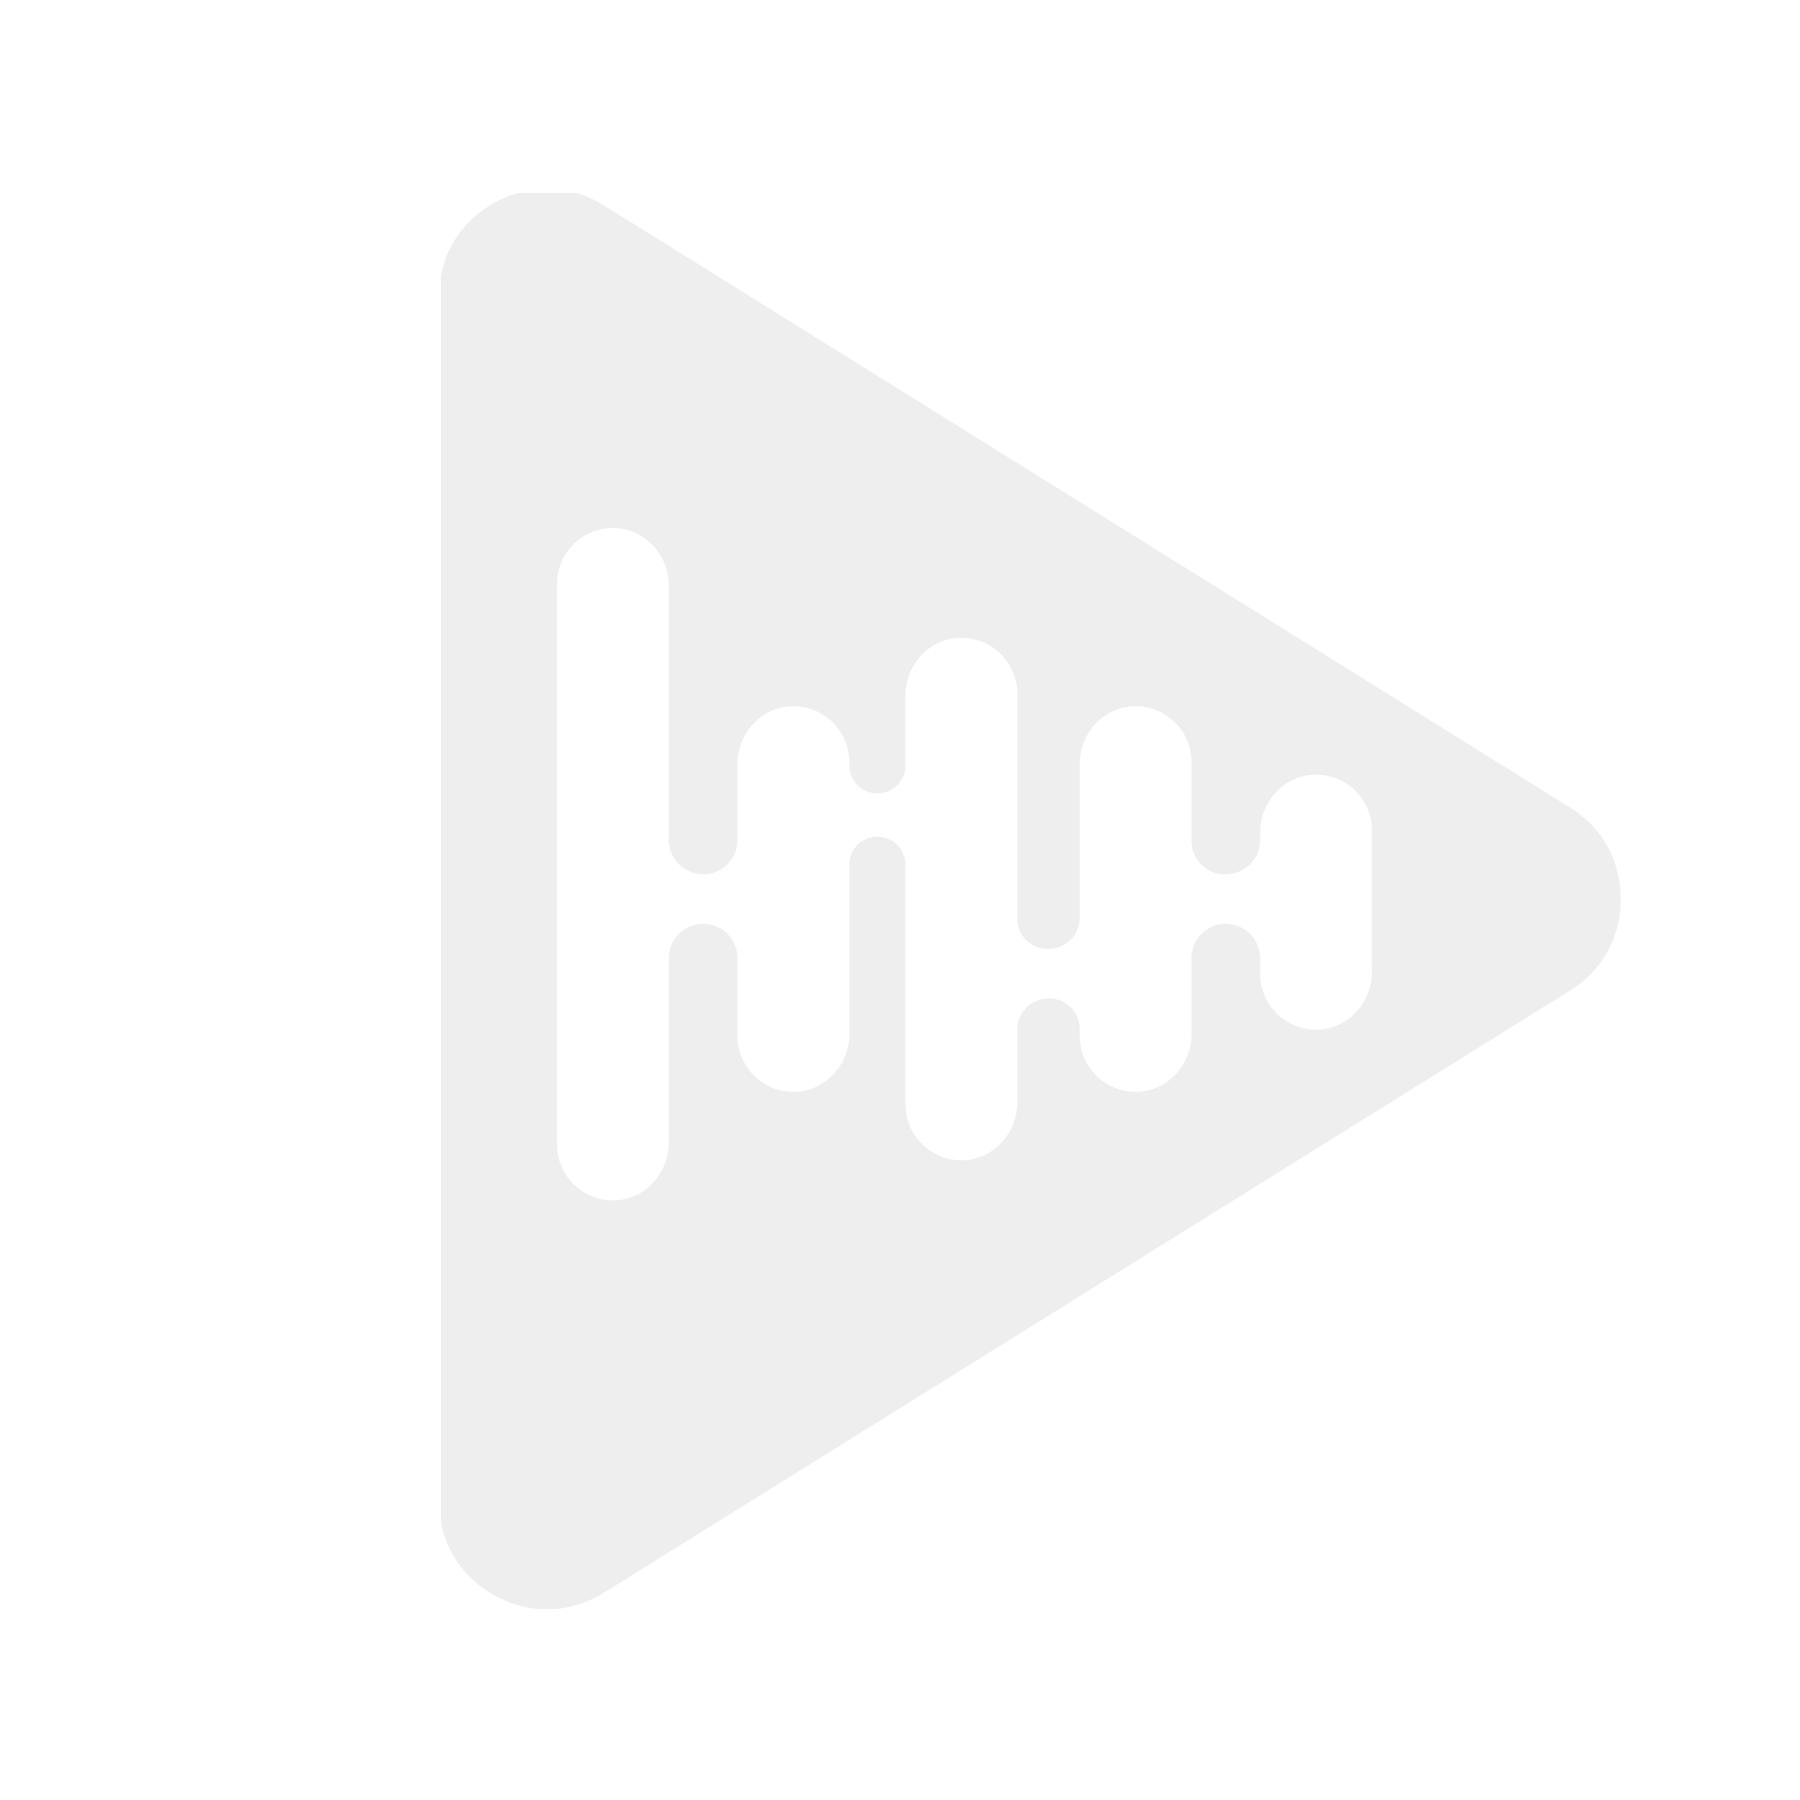 Magnat Unistand 500 - Høyttalerstativ, 62,5cm, Sølv